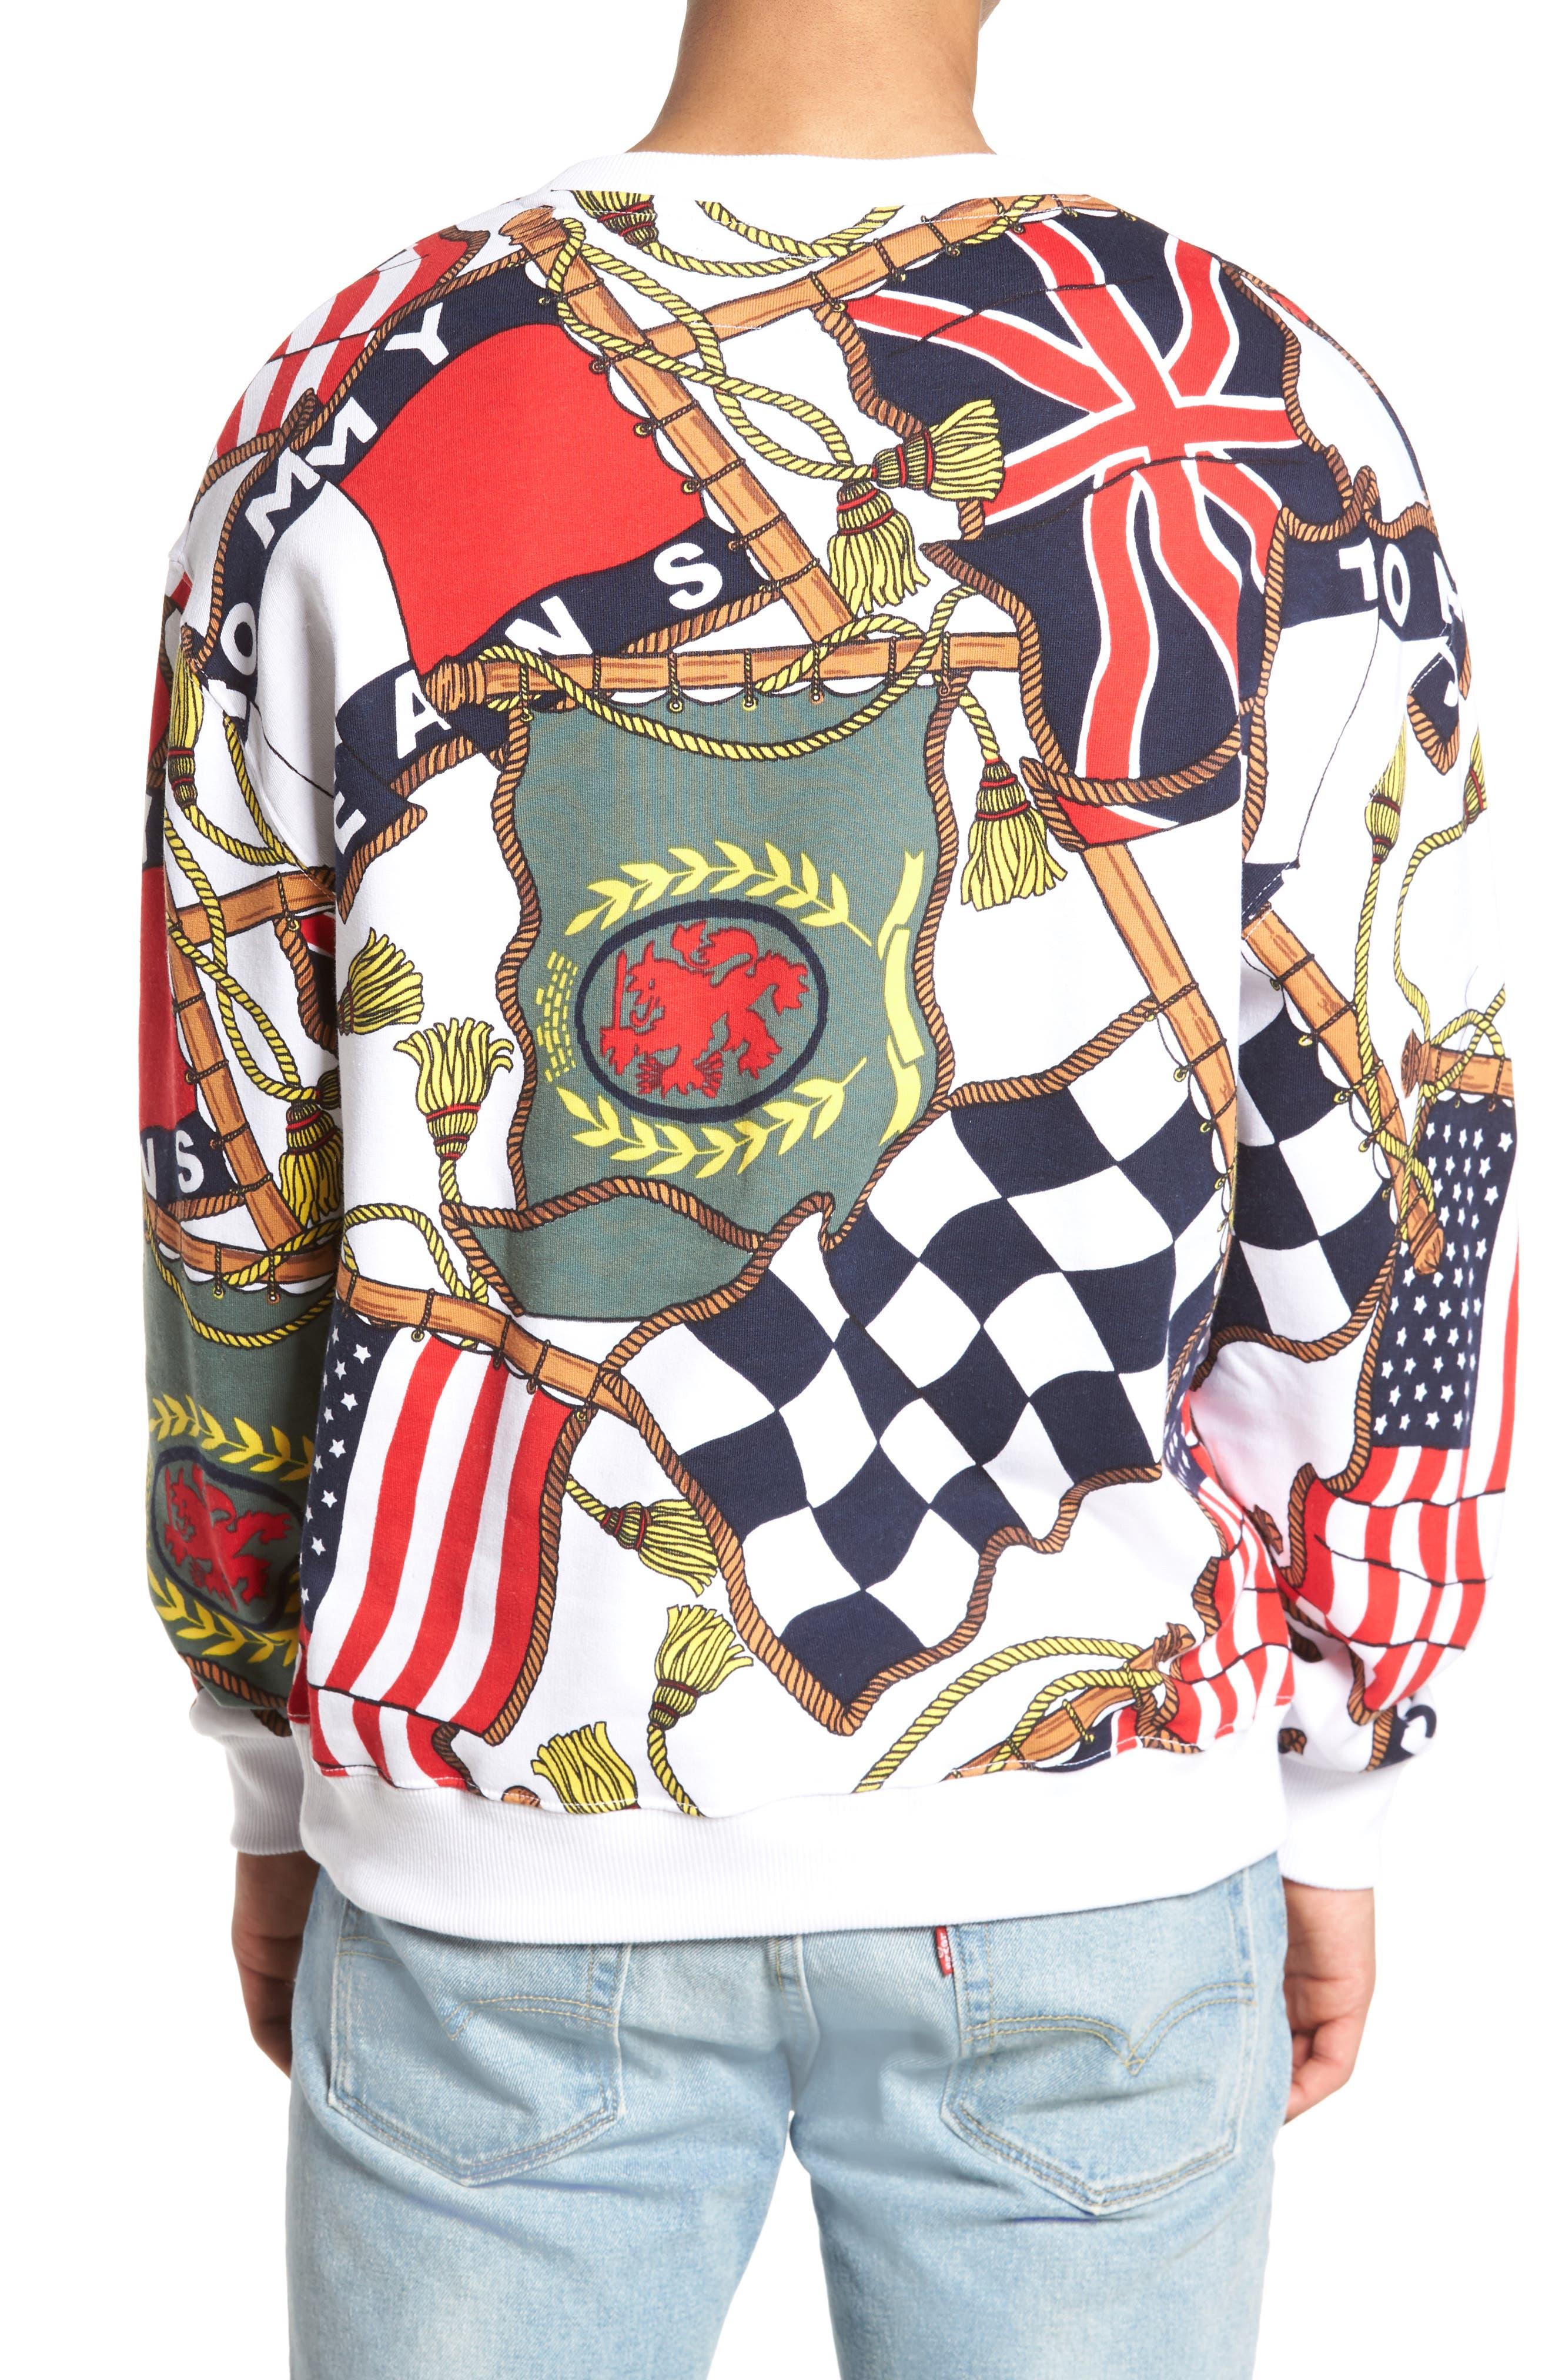 TOMMY HILFIGER,                             90s Sweatshirt,                             Alternate thumbnail 2, color,                             101